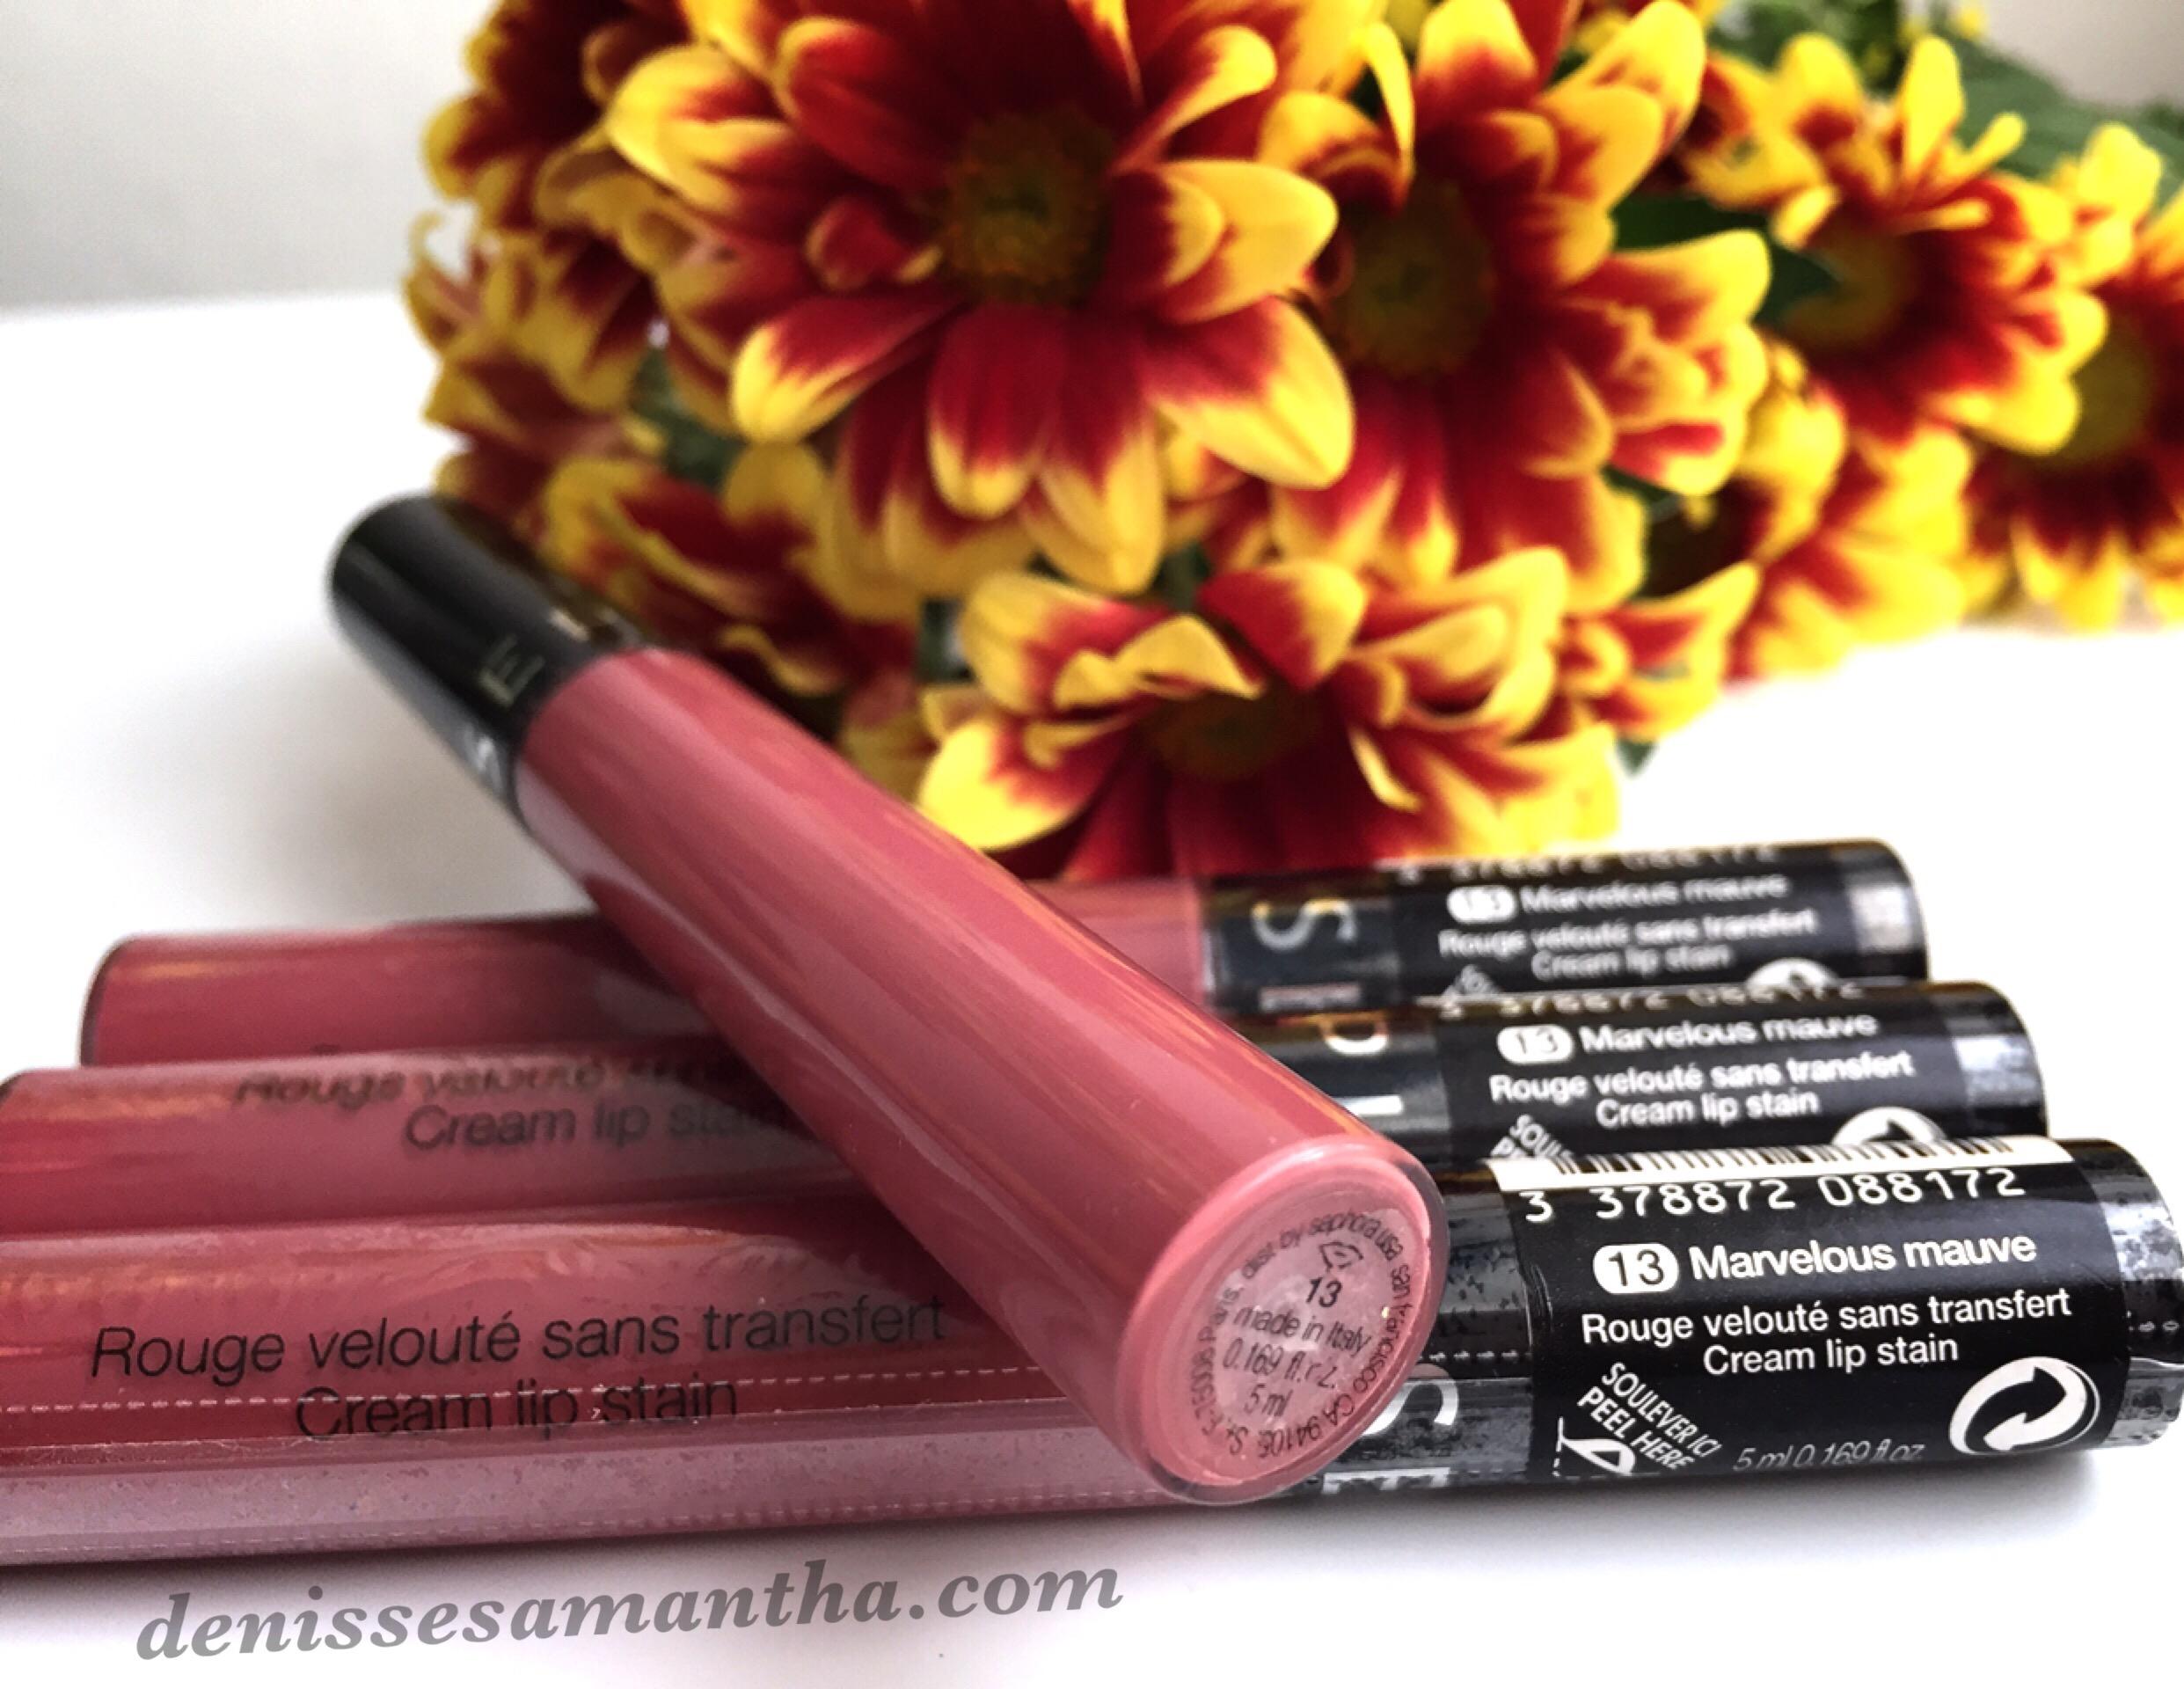 Sephora Cream Lip Stain in Marvelous Mauve Review